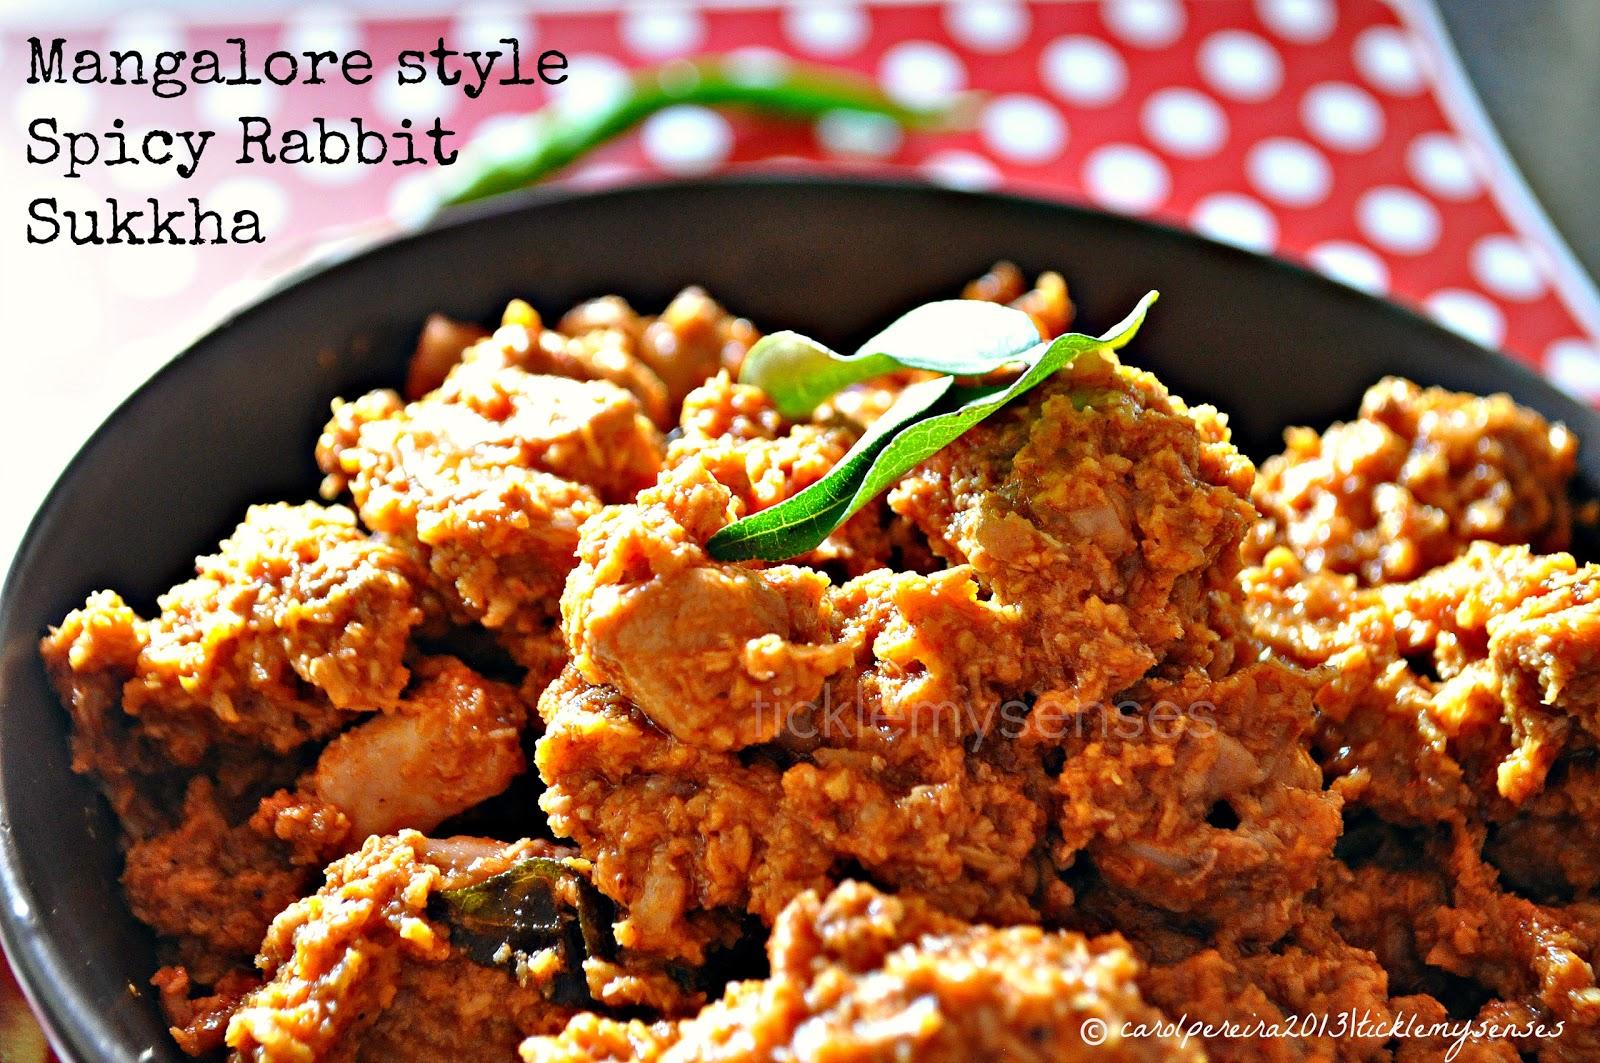 ... Style Spicy Rabbit Sukka/ Sukkha, Rabbit in a Spicy Dry Coconut Gravy